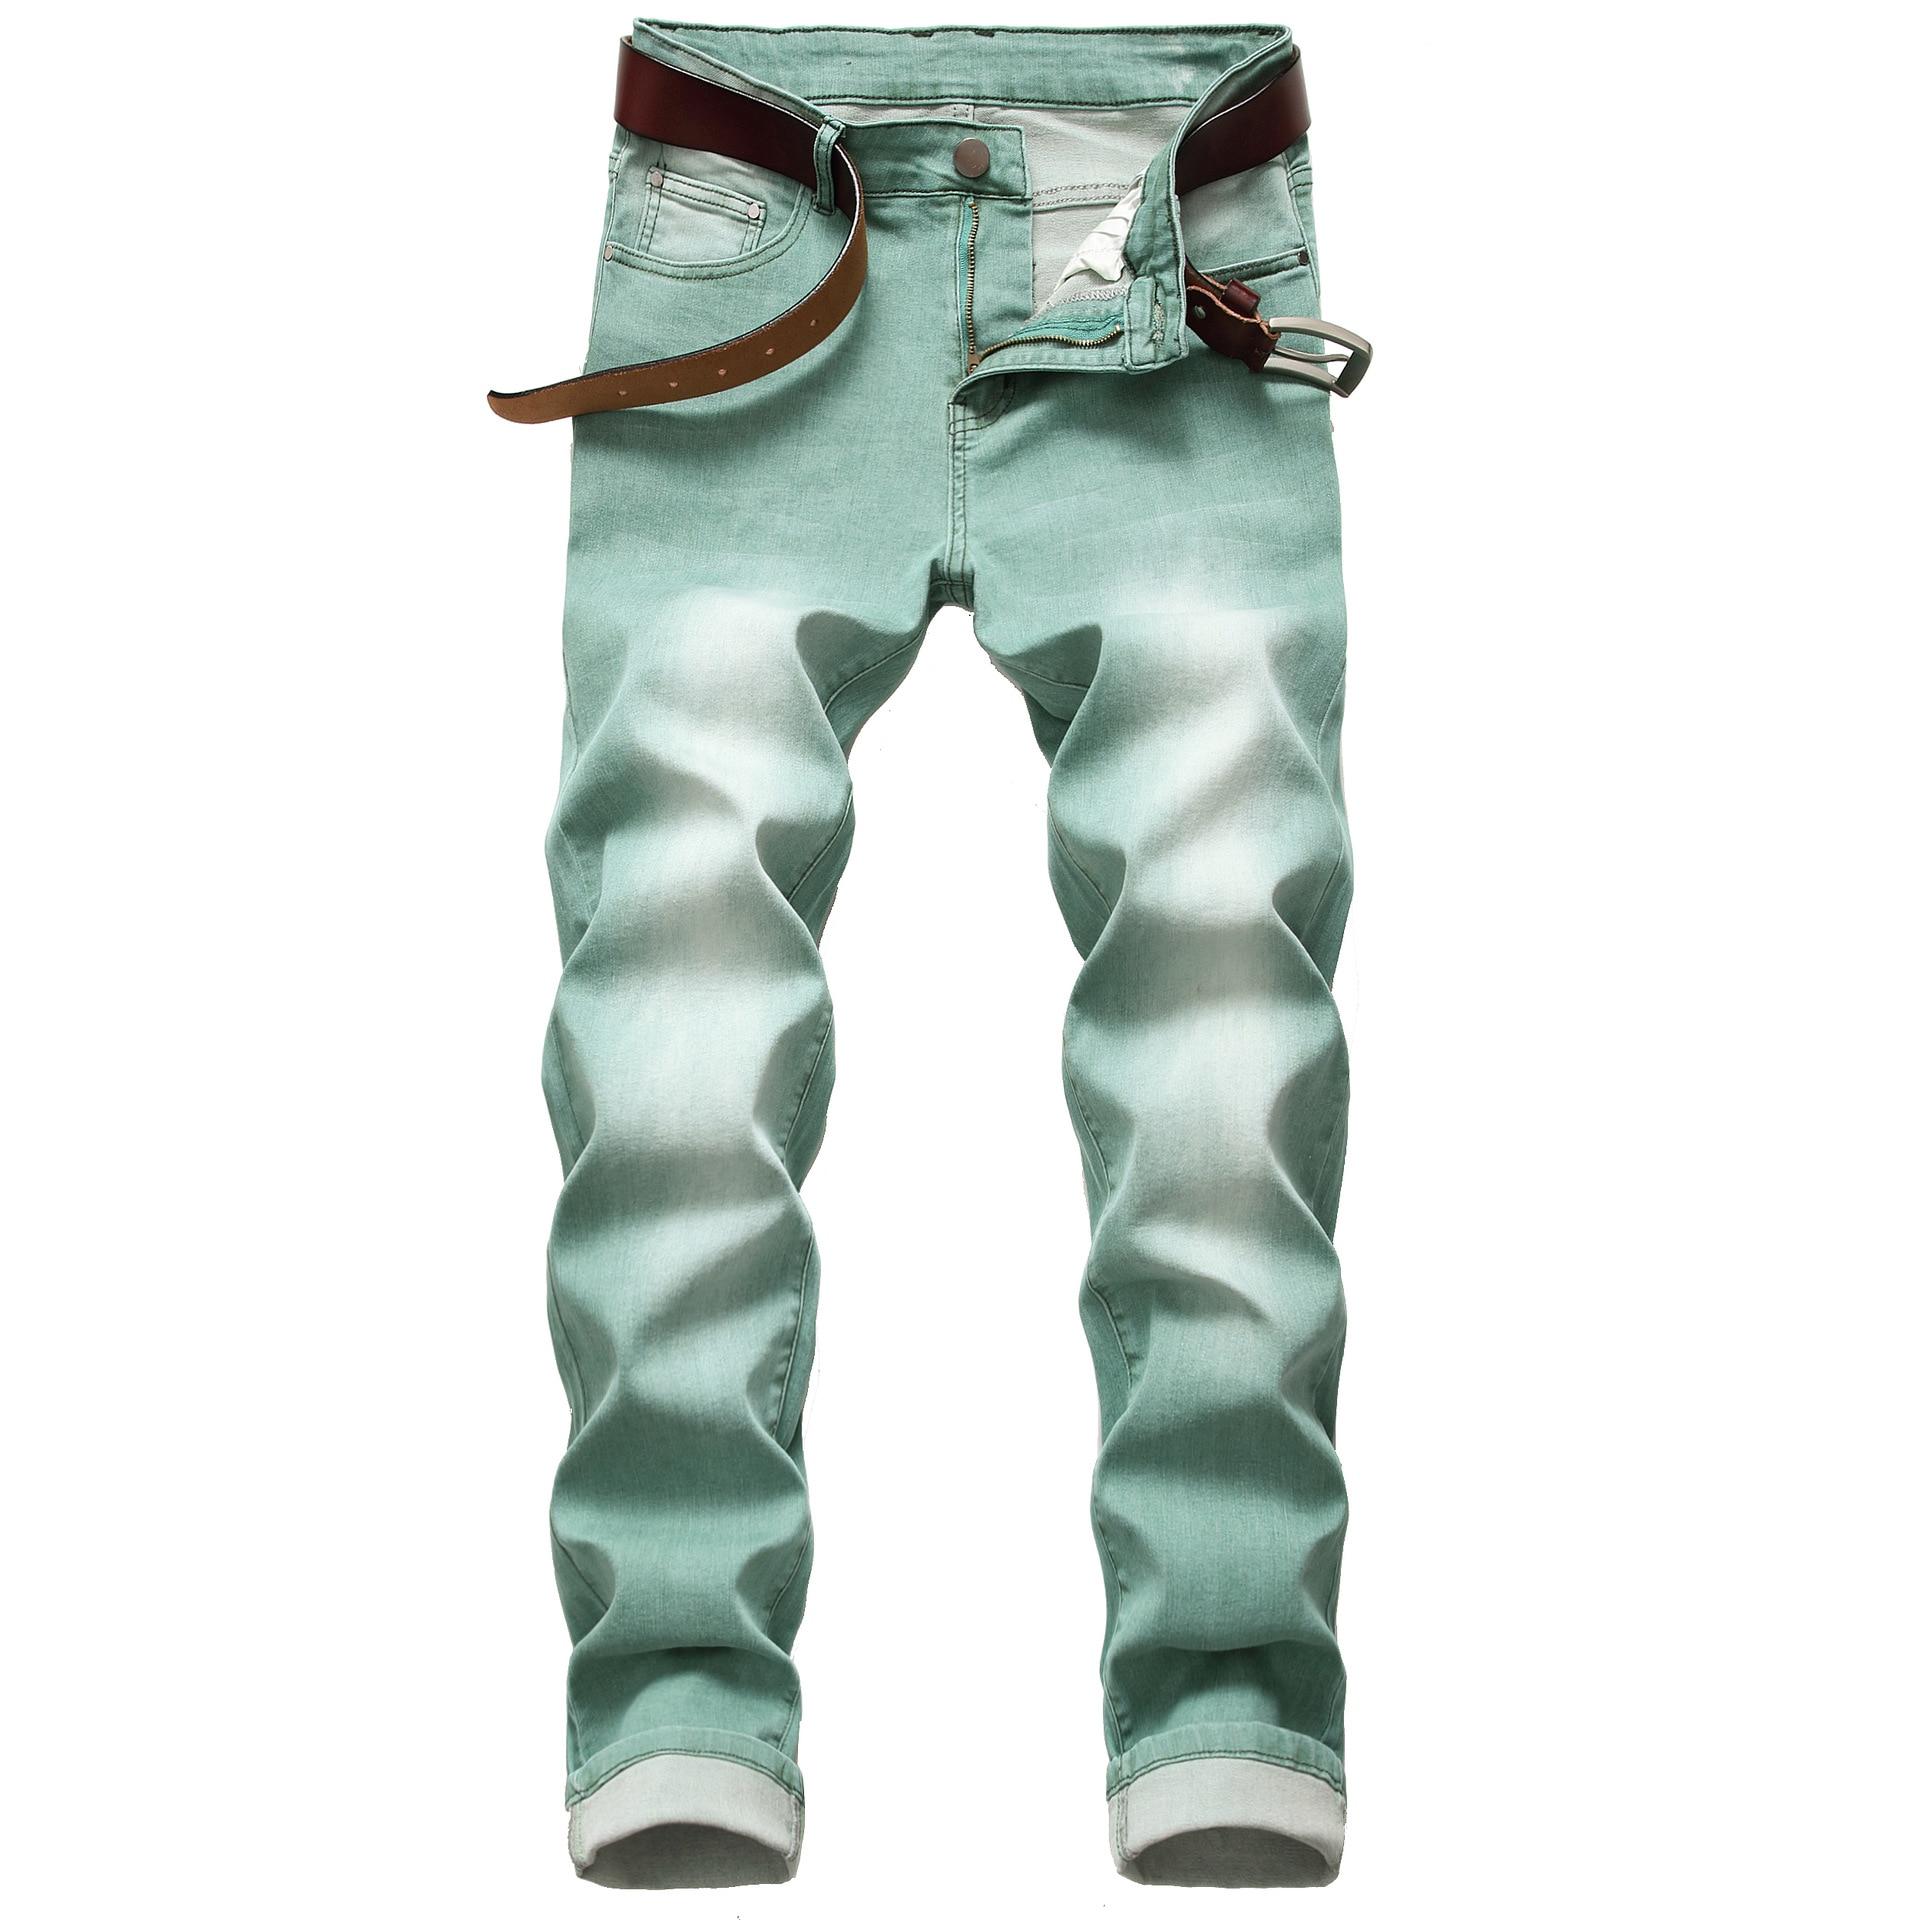 2020 AUTUMN Spring Men's Ripped Green Street HIP HOP Punk Stretch Bike Jeans Trendy Holes Straight Denim Trouers